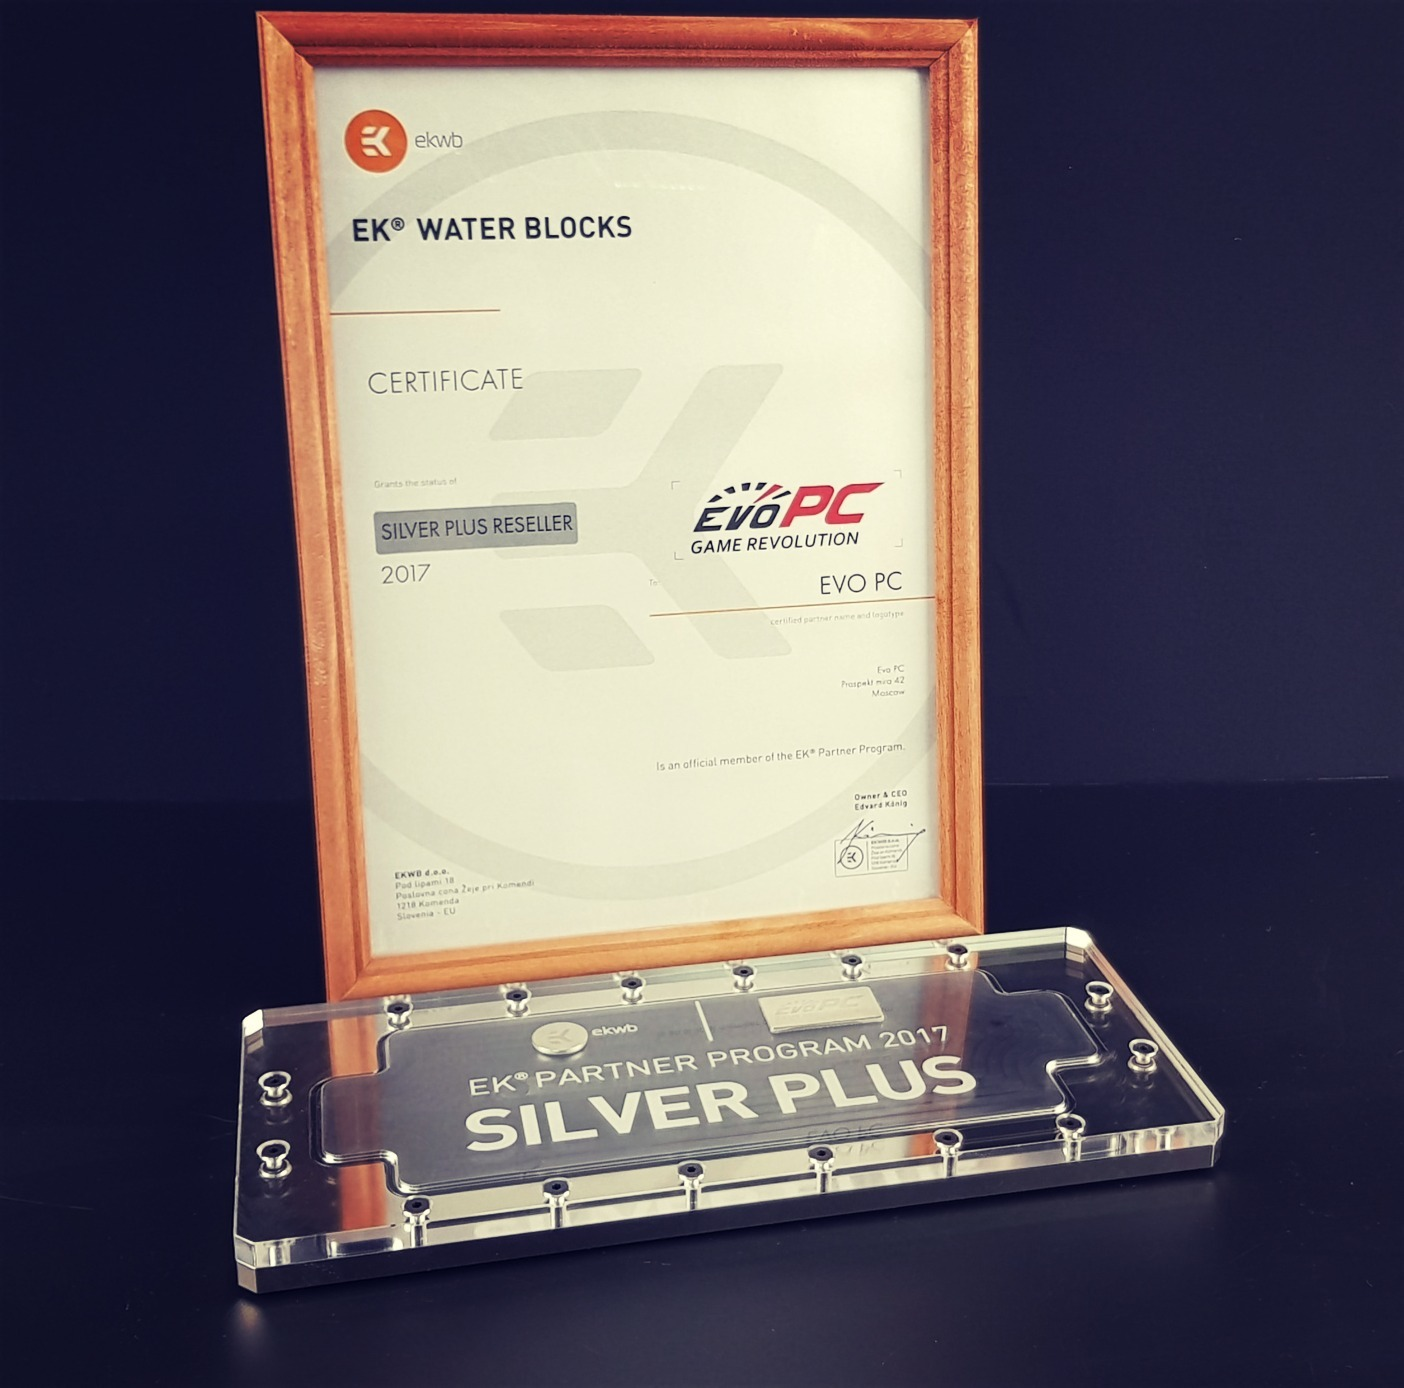 Награждение EvoPC ведущим производителем EK Water Blocks